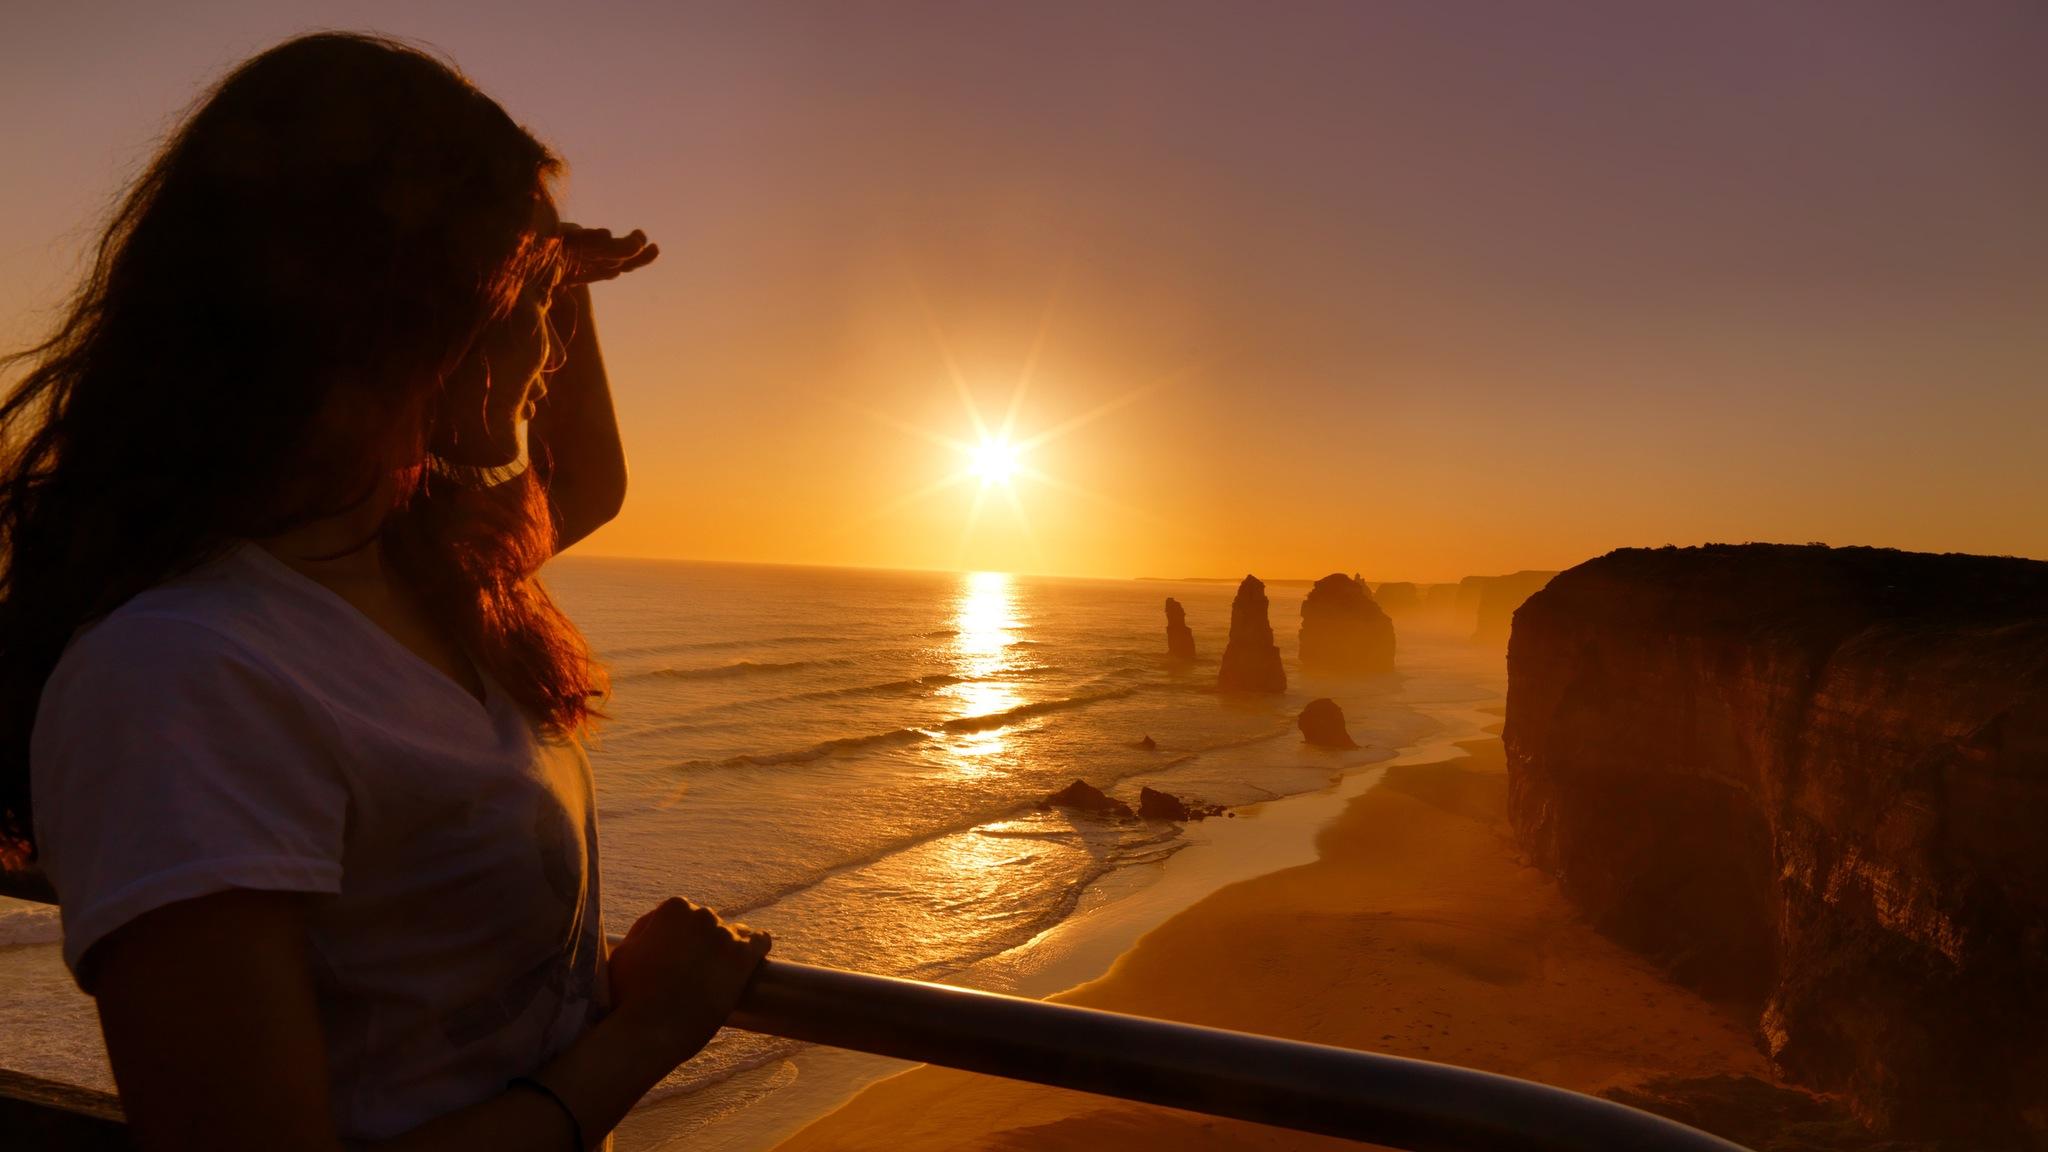 Sunset at the iconic Twelve Apostles